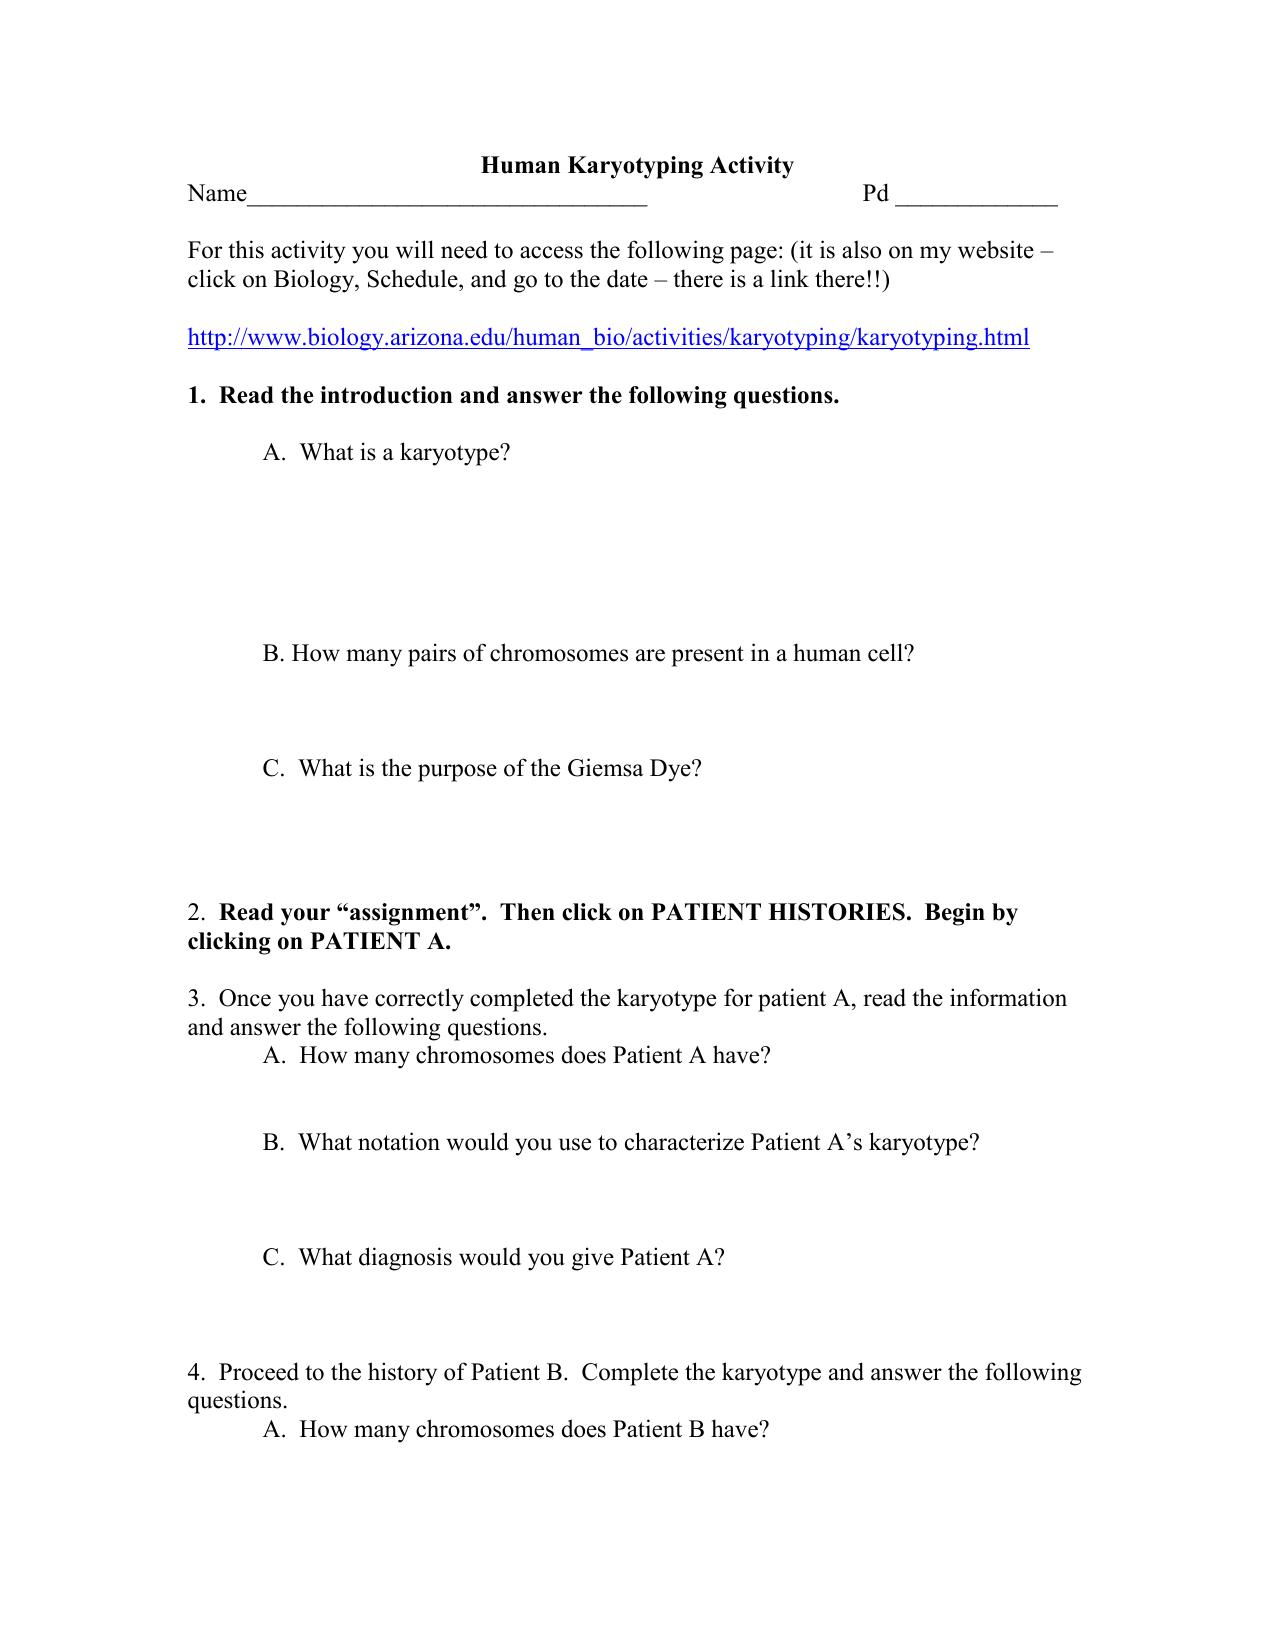 Biology Karyotype Worksheet Answers Key